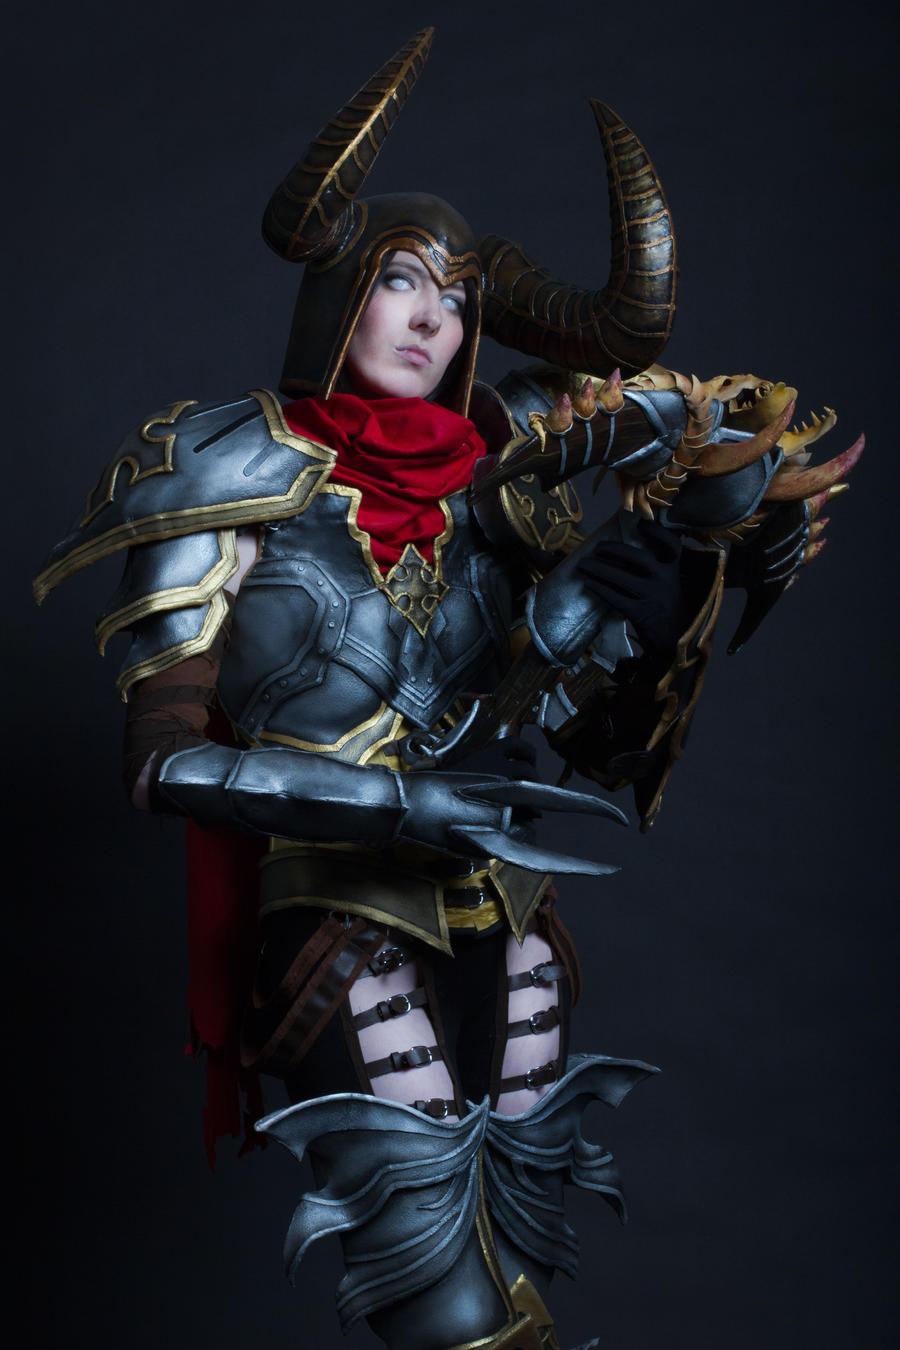 Diablo III Demon Hunter Cosplay by emilyrosa